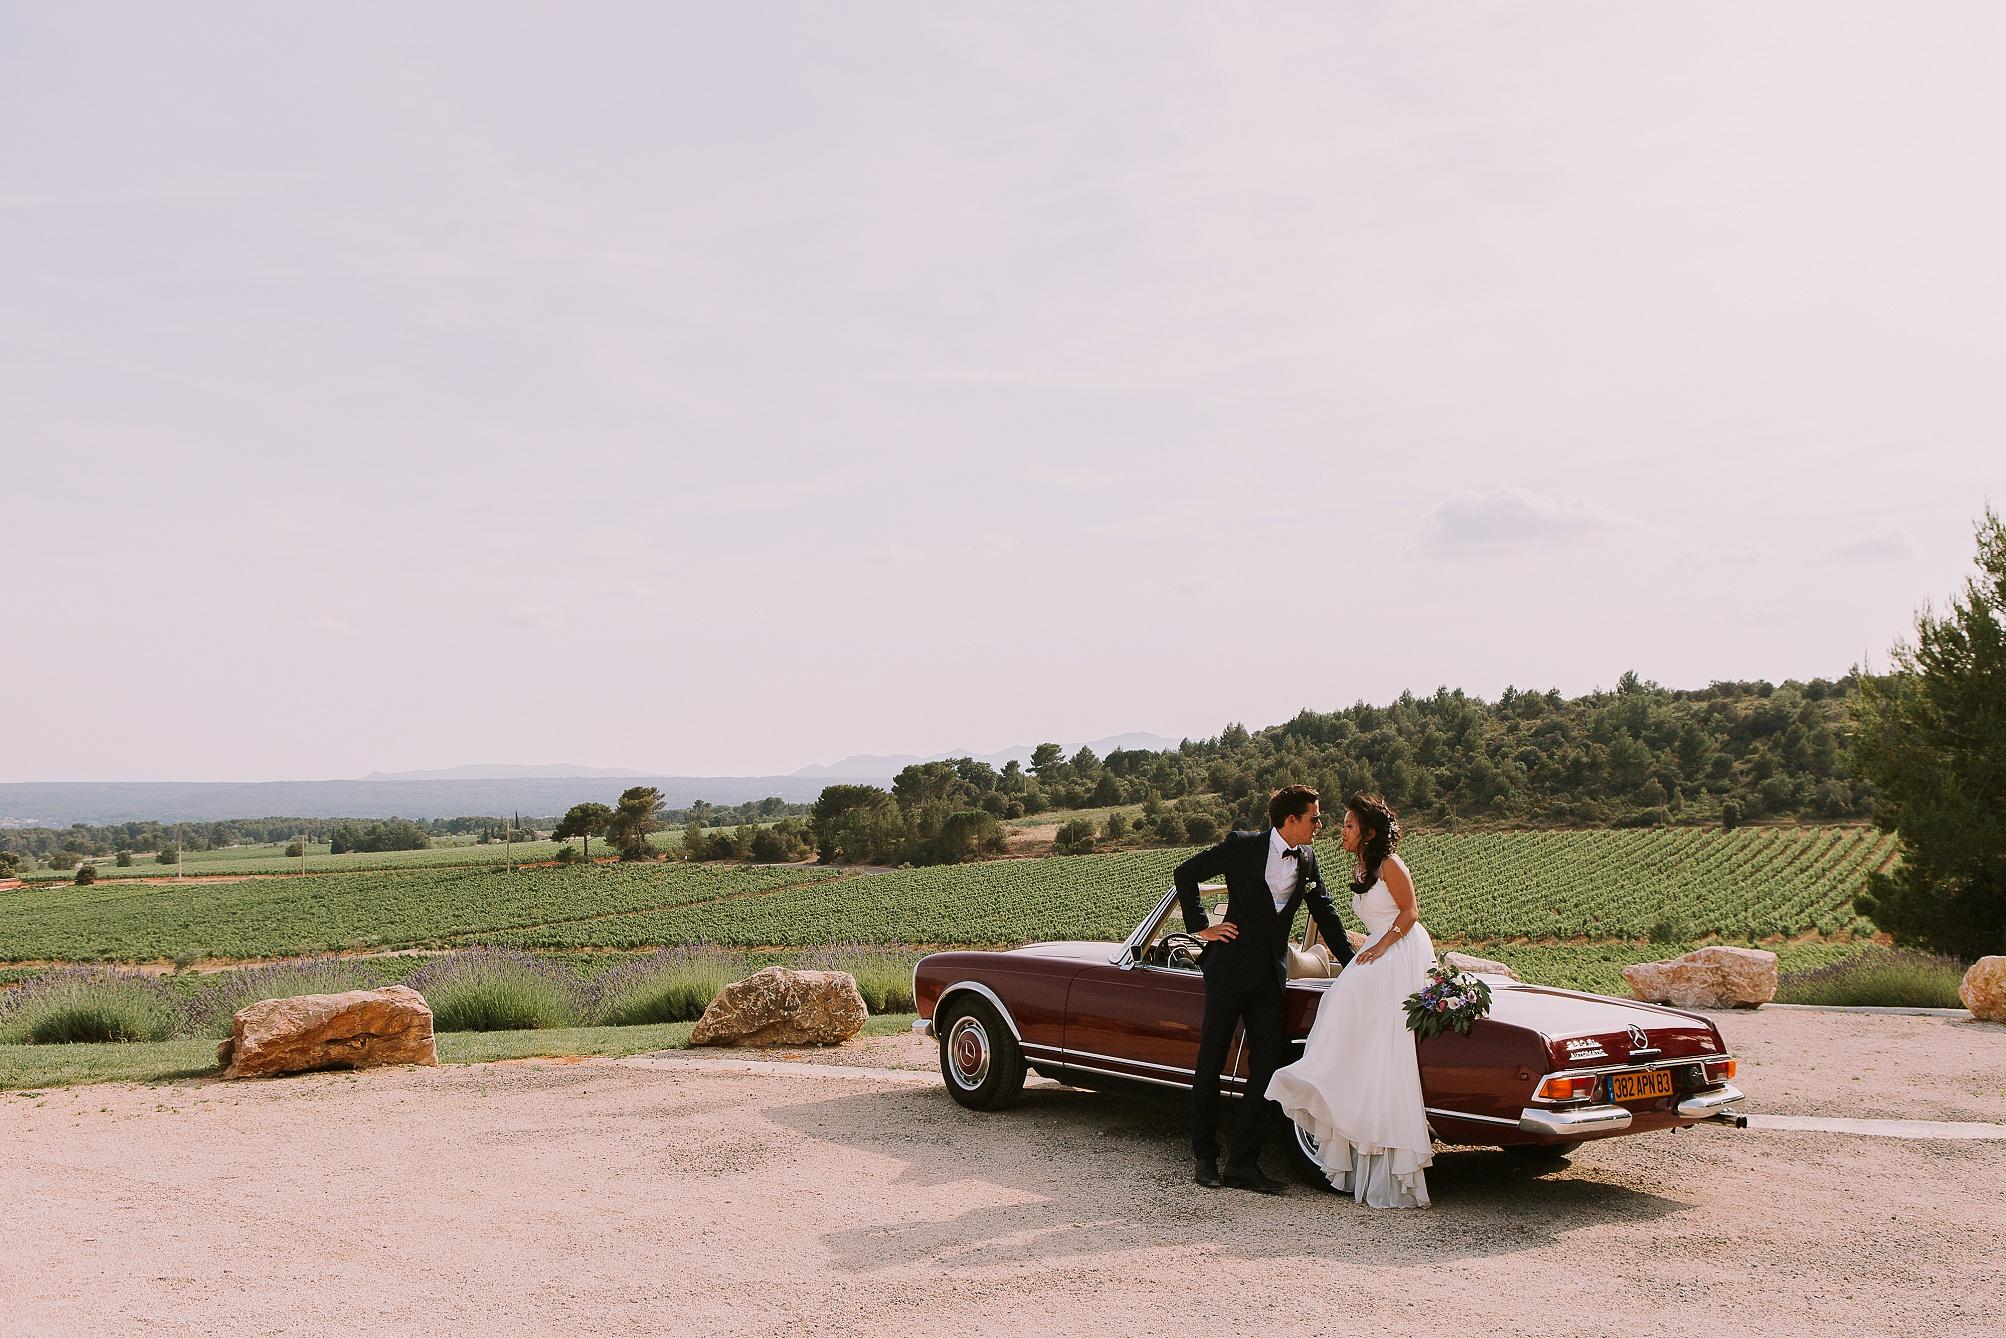 katerynaphotos-mariage-photographe-puyloubier-provence-aix-en-provence-sud-de-la-france_0399.jpg